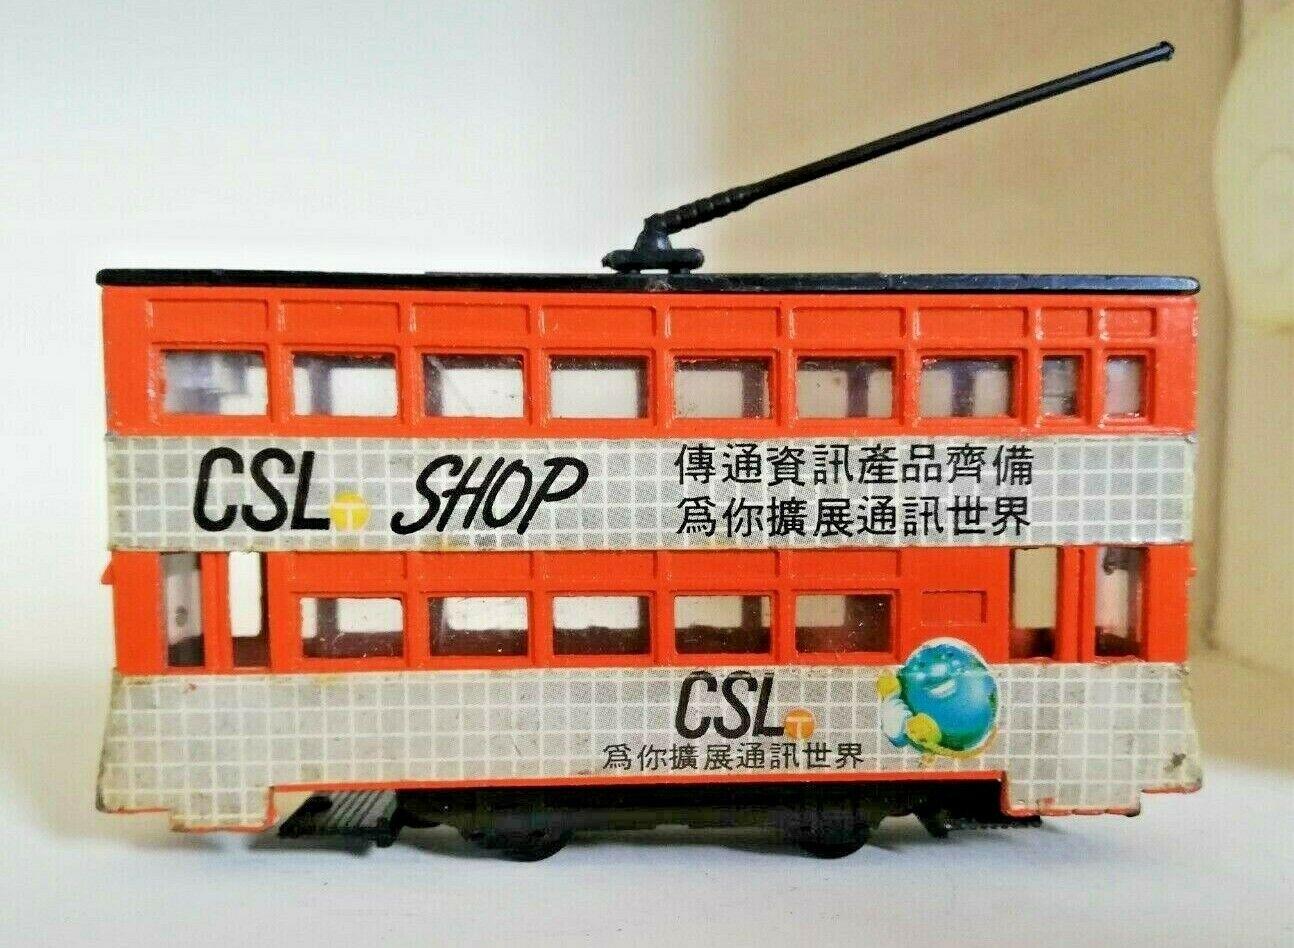 Rare 1987 Vintage orange Hong Kong Tram Diecast Model Toy CSL Shop Ad WJB 1 90